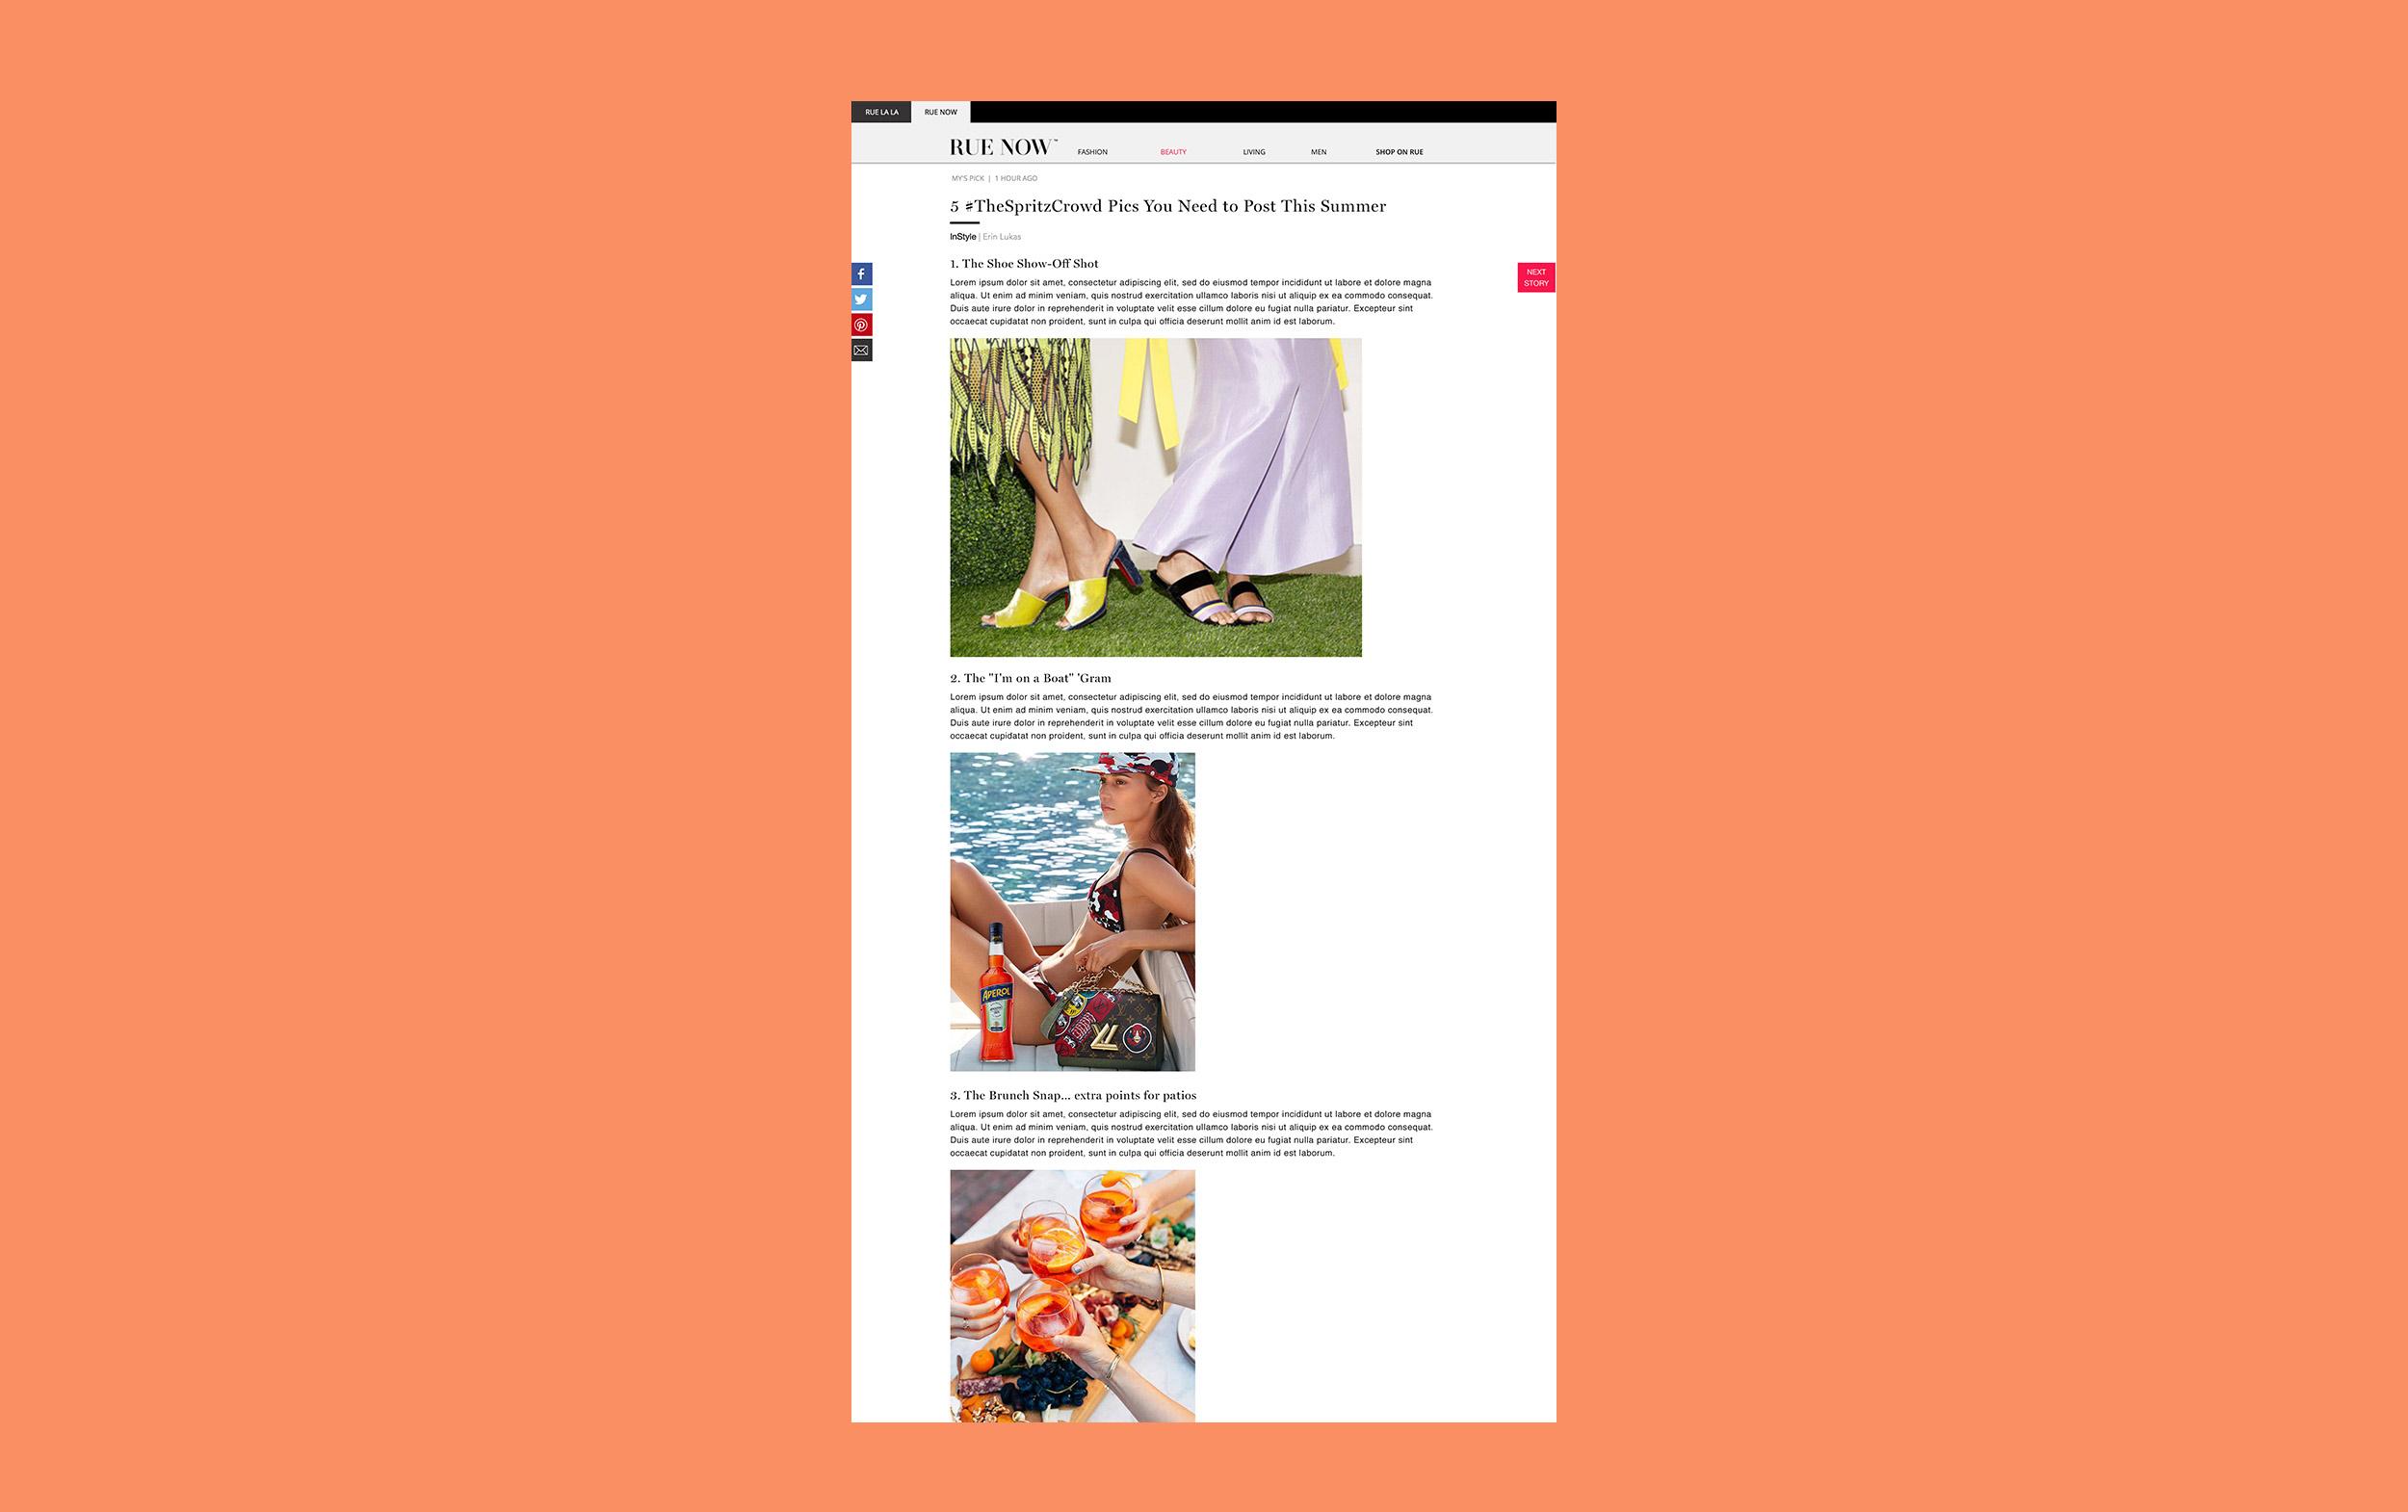 email-lvg-lvgdesigns-lvgworks-graphic-design-designer-type-typeography-font-drink-alcohol-fashion-photography-concept-collage-blog.jpg